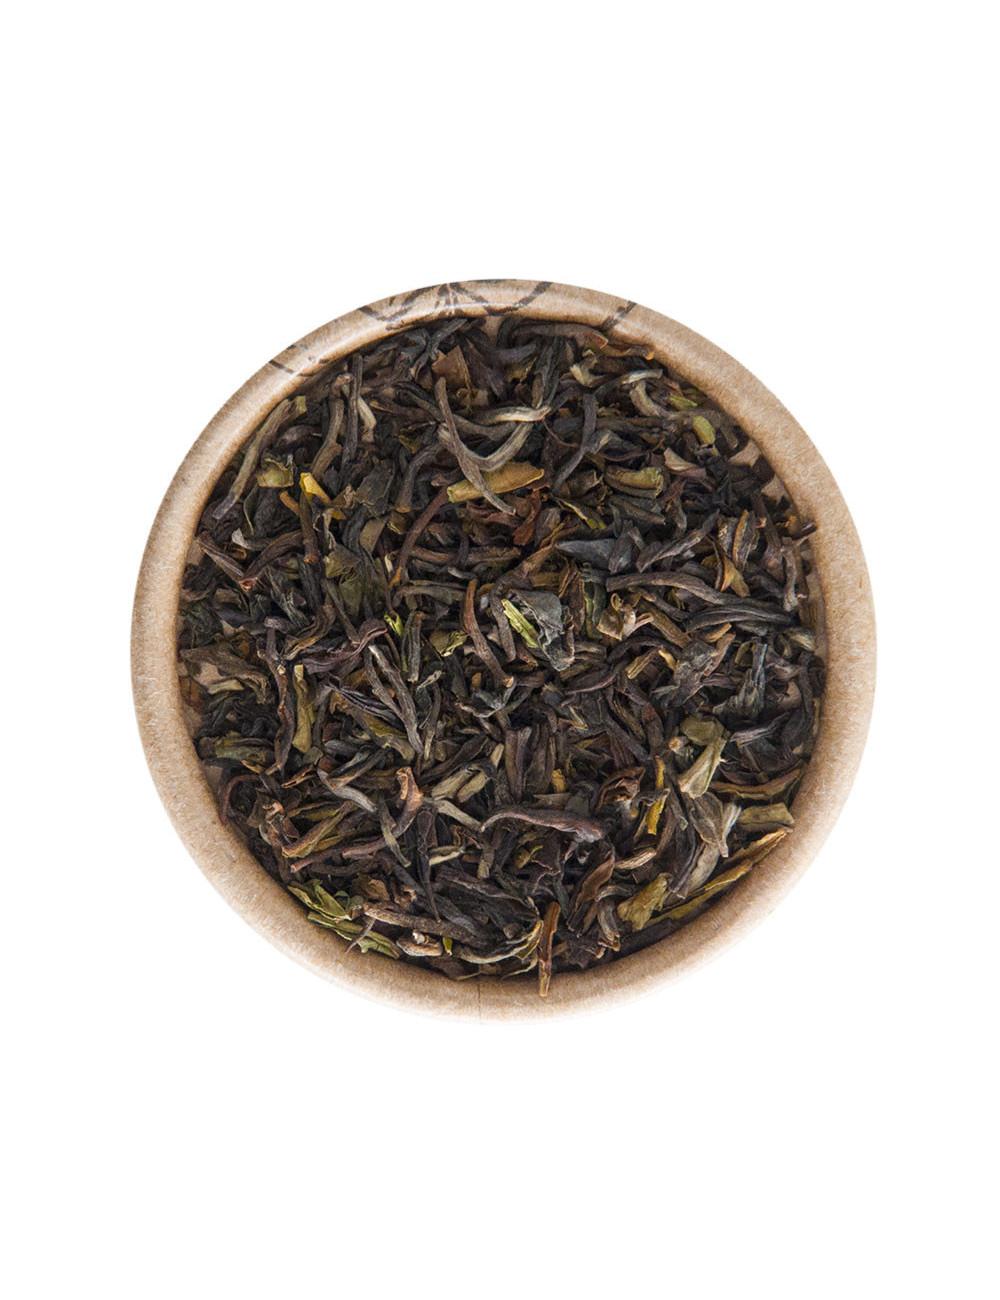 Darjeeling First Flush FTGFOP1 BIO tè nero - La Pianta del Tè shop online